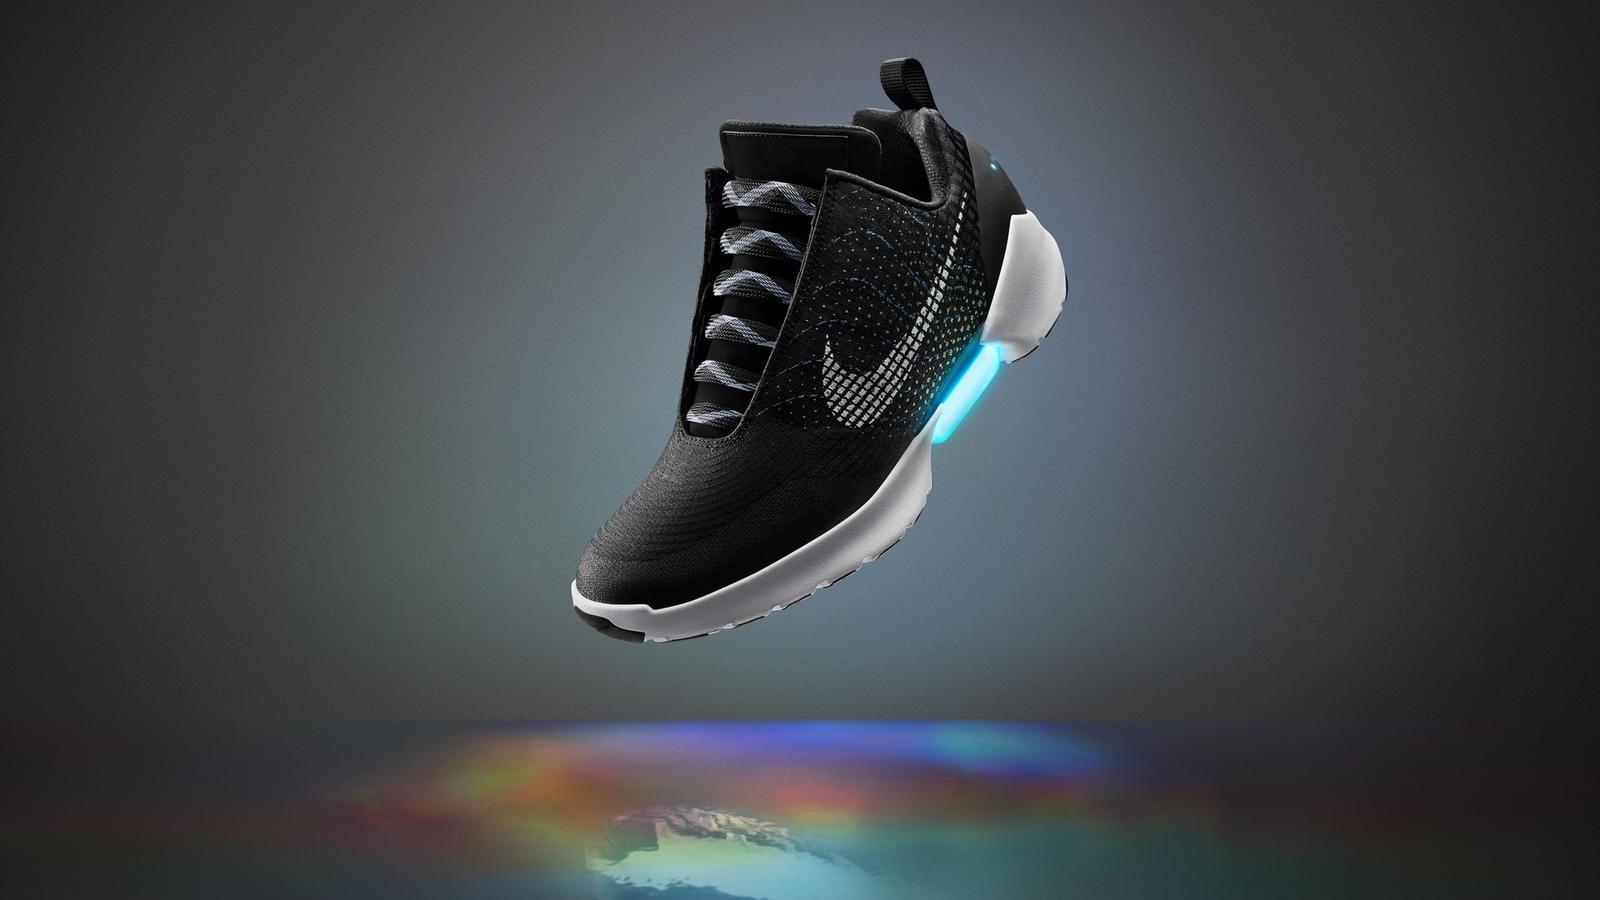 Nike HyperAdapt shoes